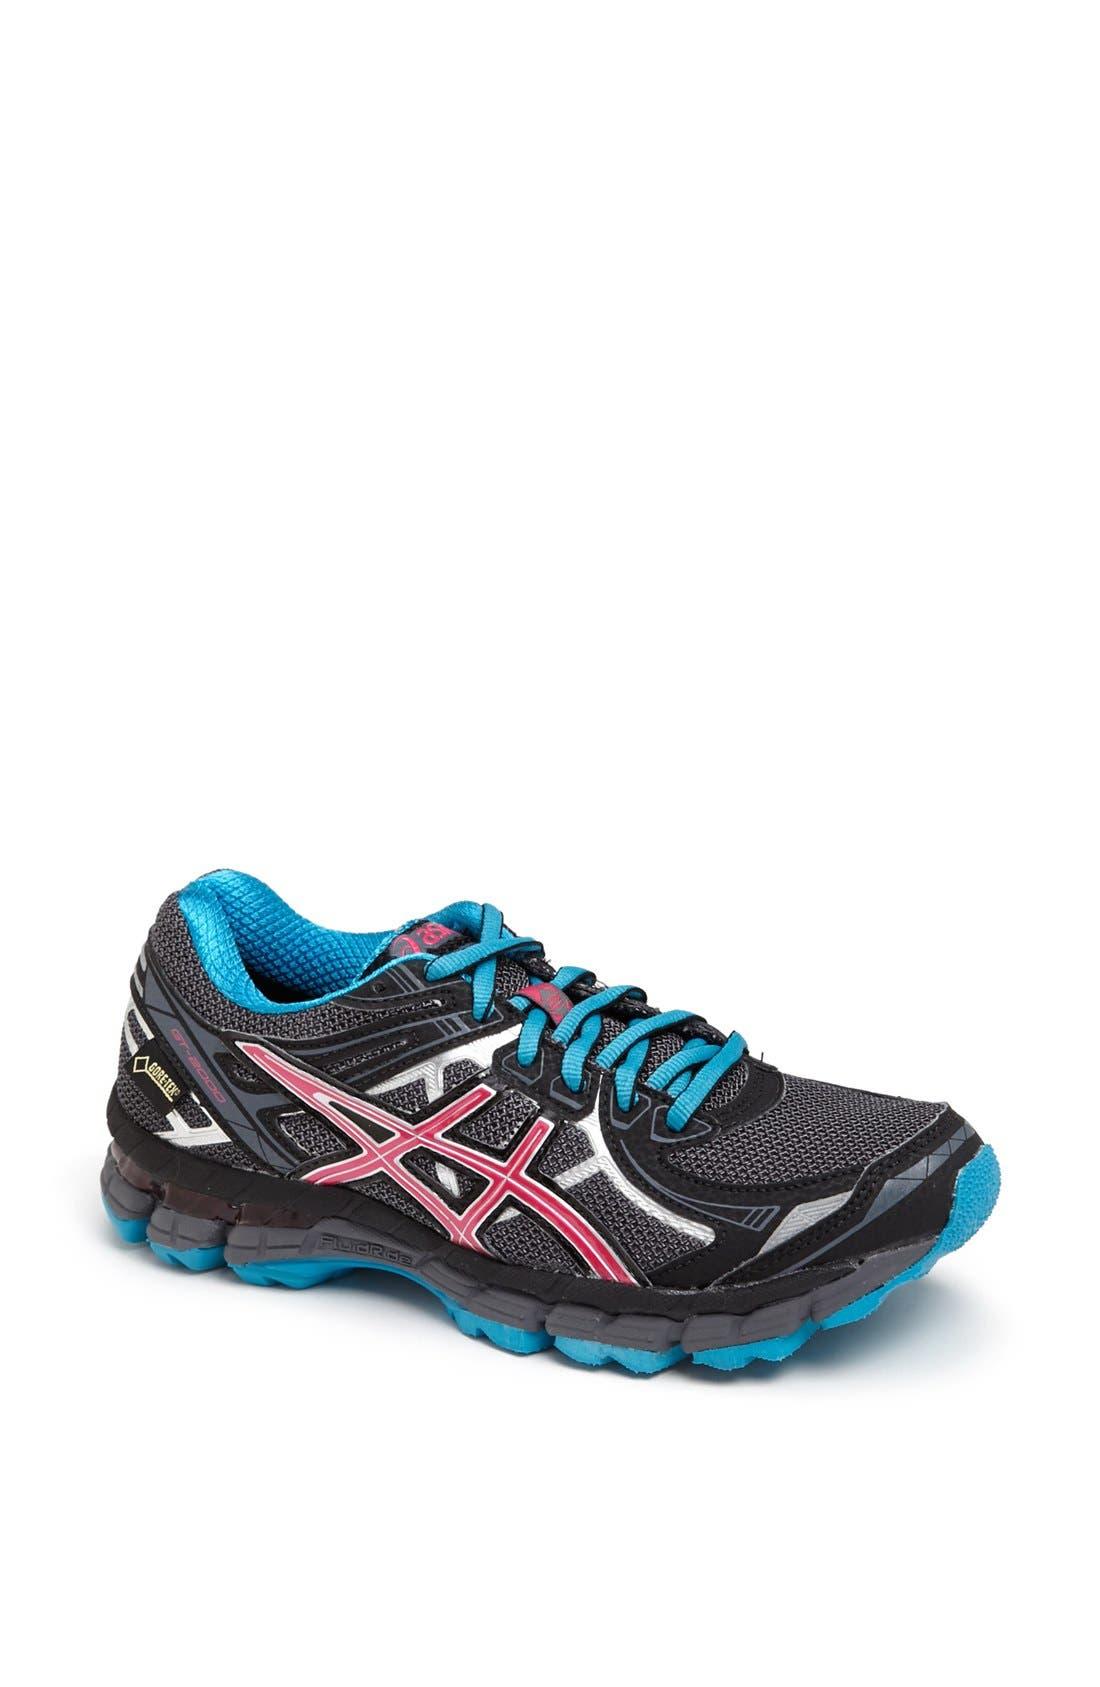 Alternate Image 1 Selected - ASICS® 'GT-2000™ G-TX' Waterproof Running Shoe (Women)